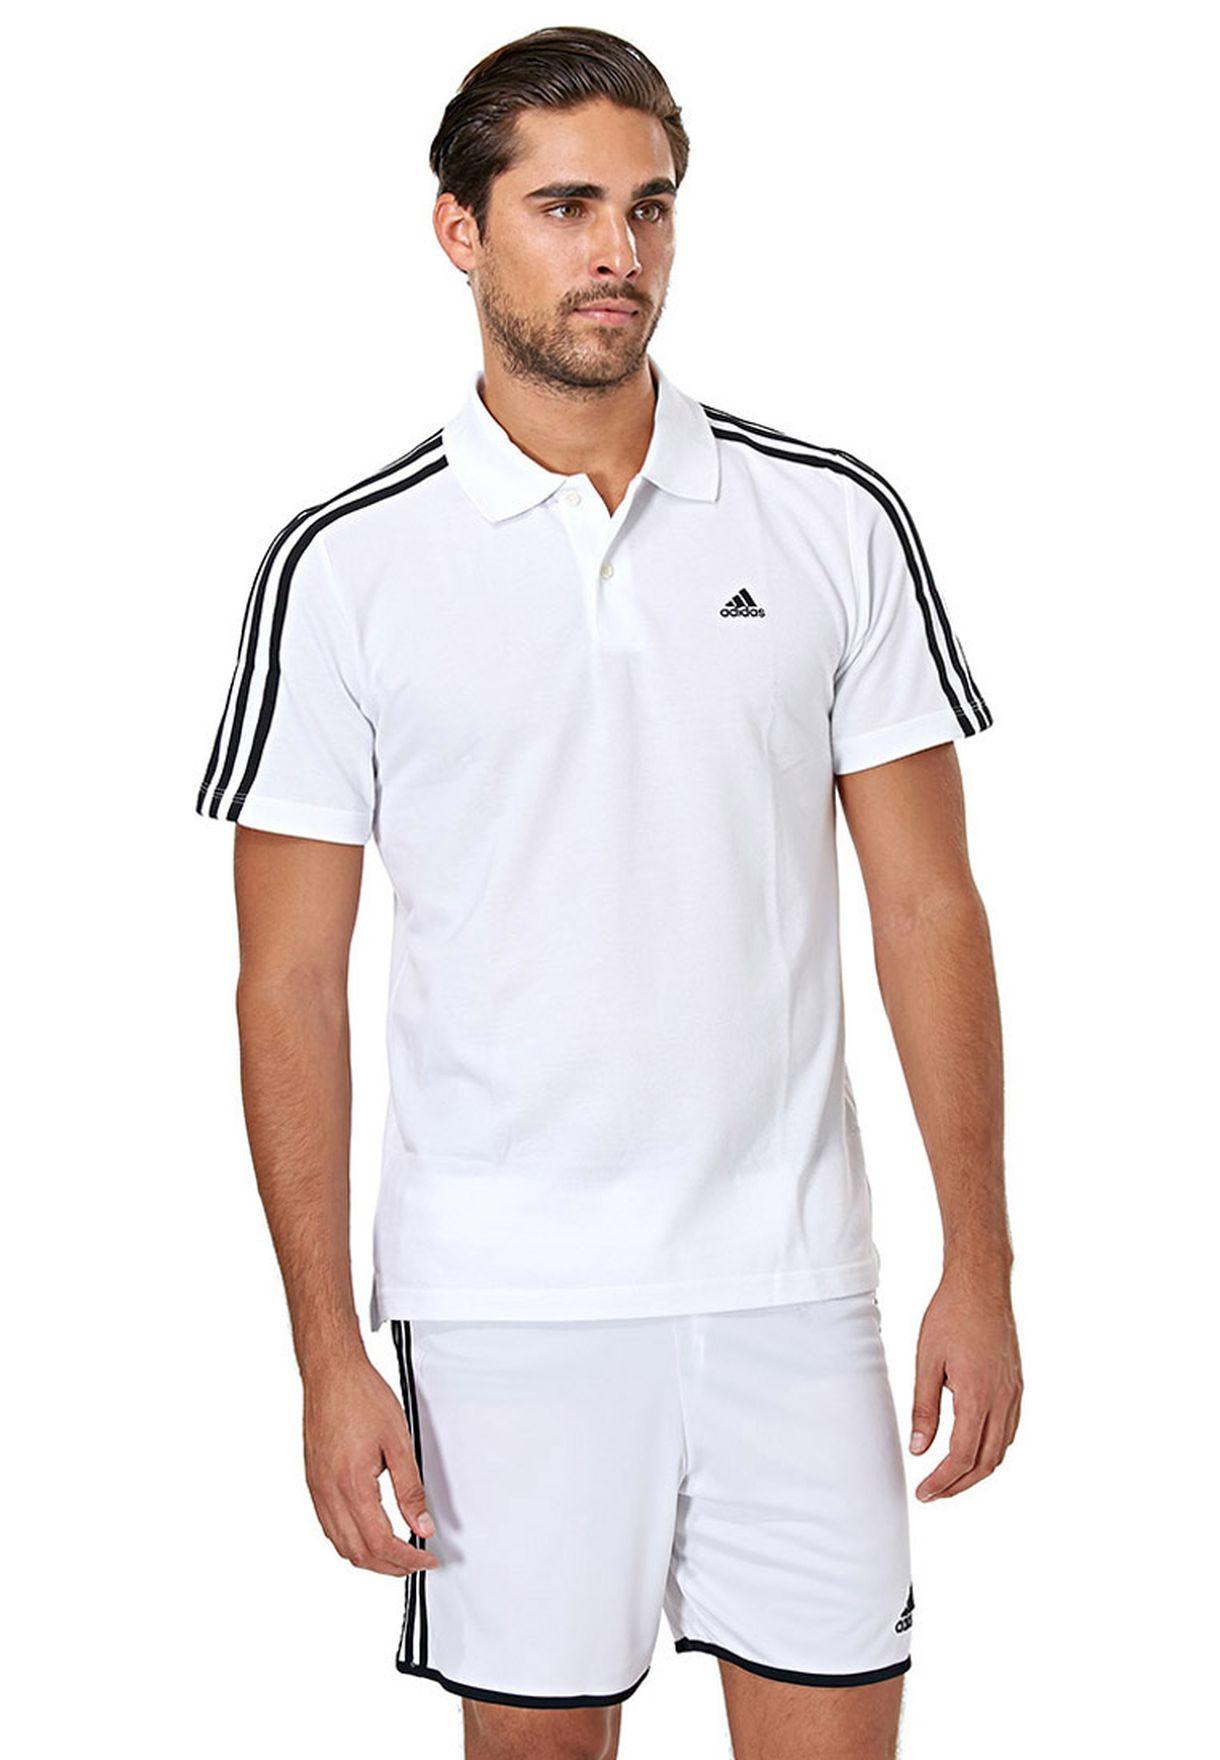 infierno encanto radiador  Buy adidas white Ess 3S Polo for Men in MENA, Worldwide | X19165